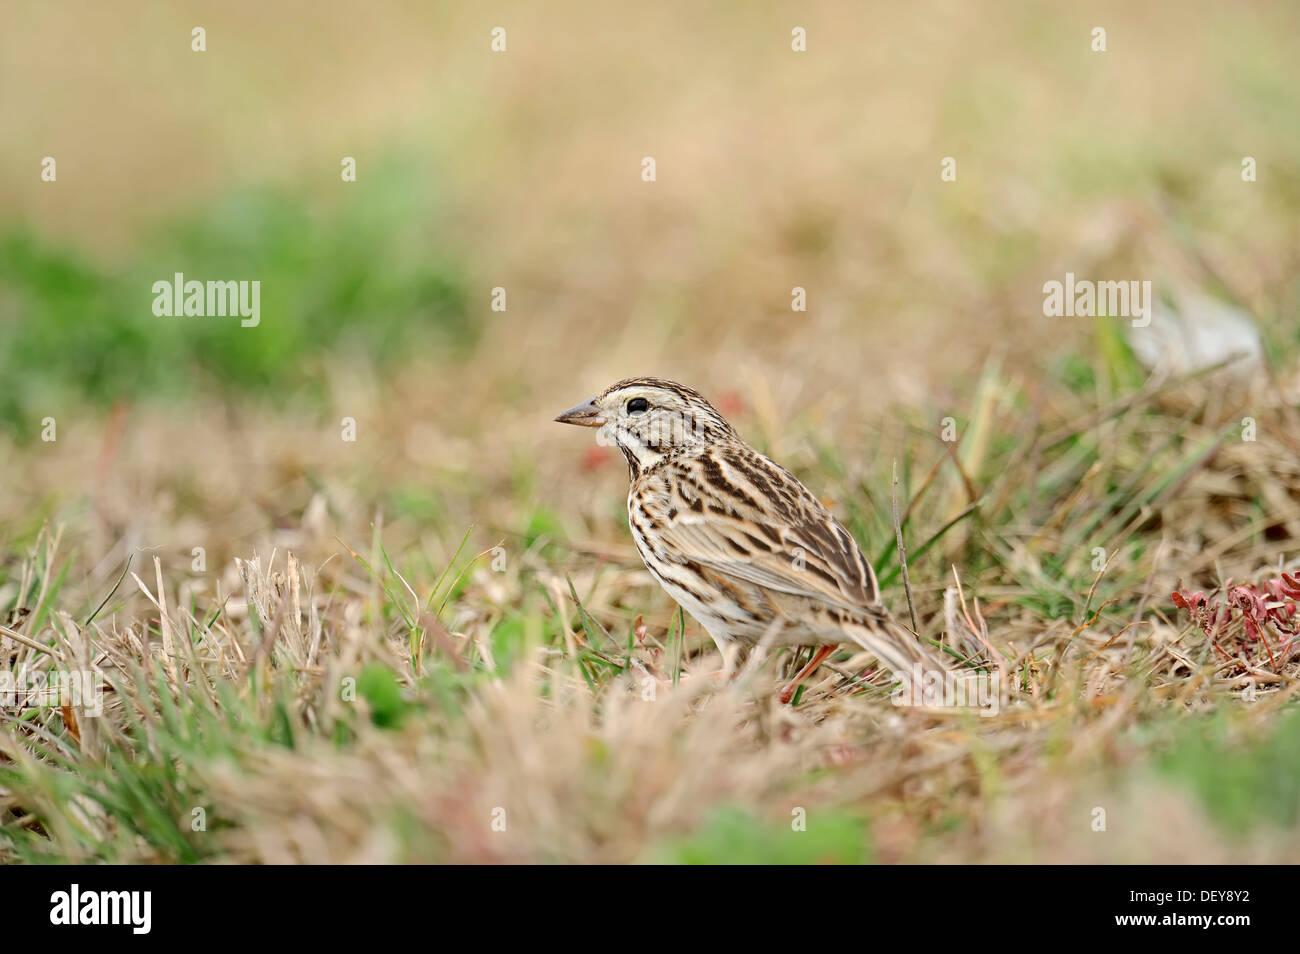 Savannah Sparrow (Passerculus sandwichensis) in the grass, Florida, United States Stock Photo